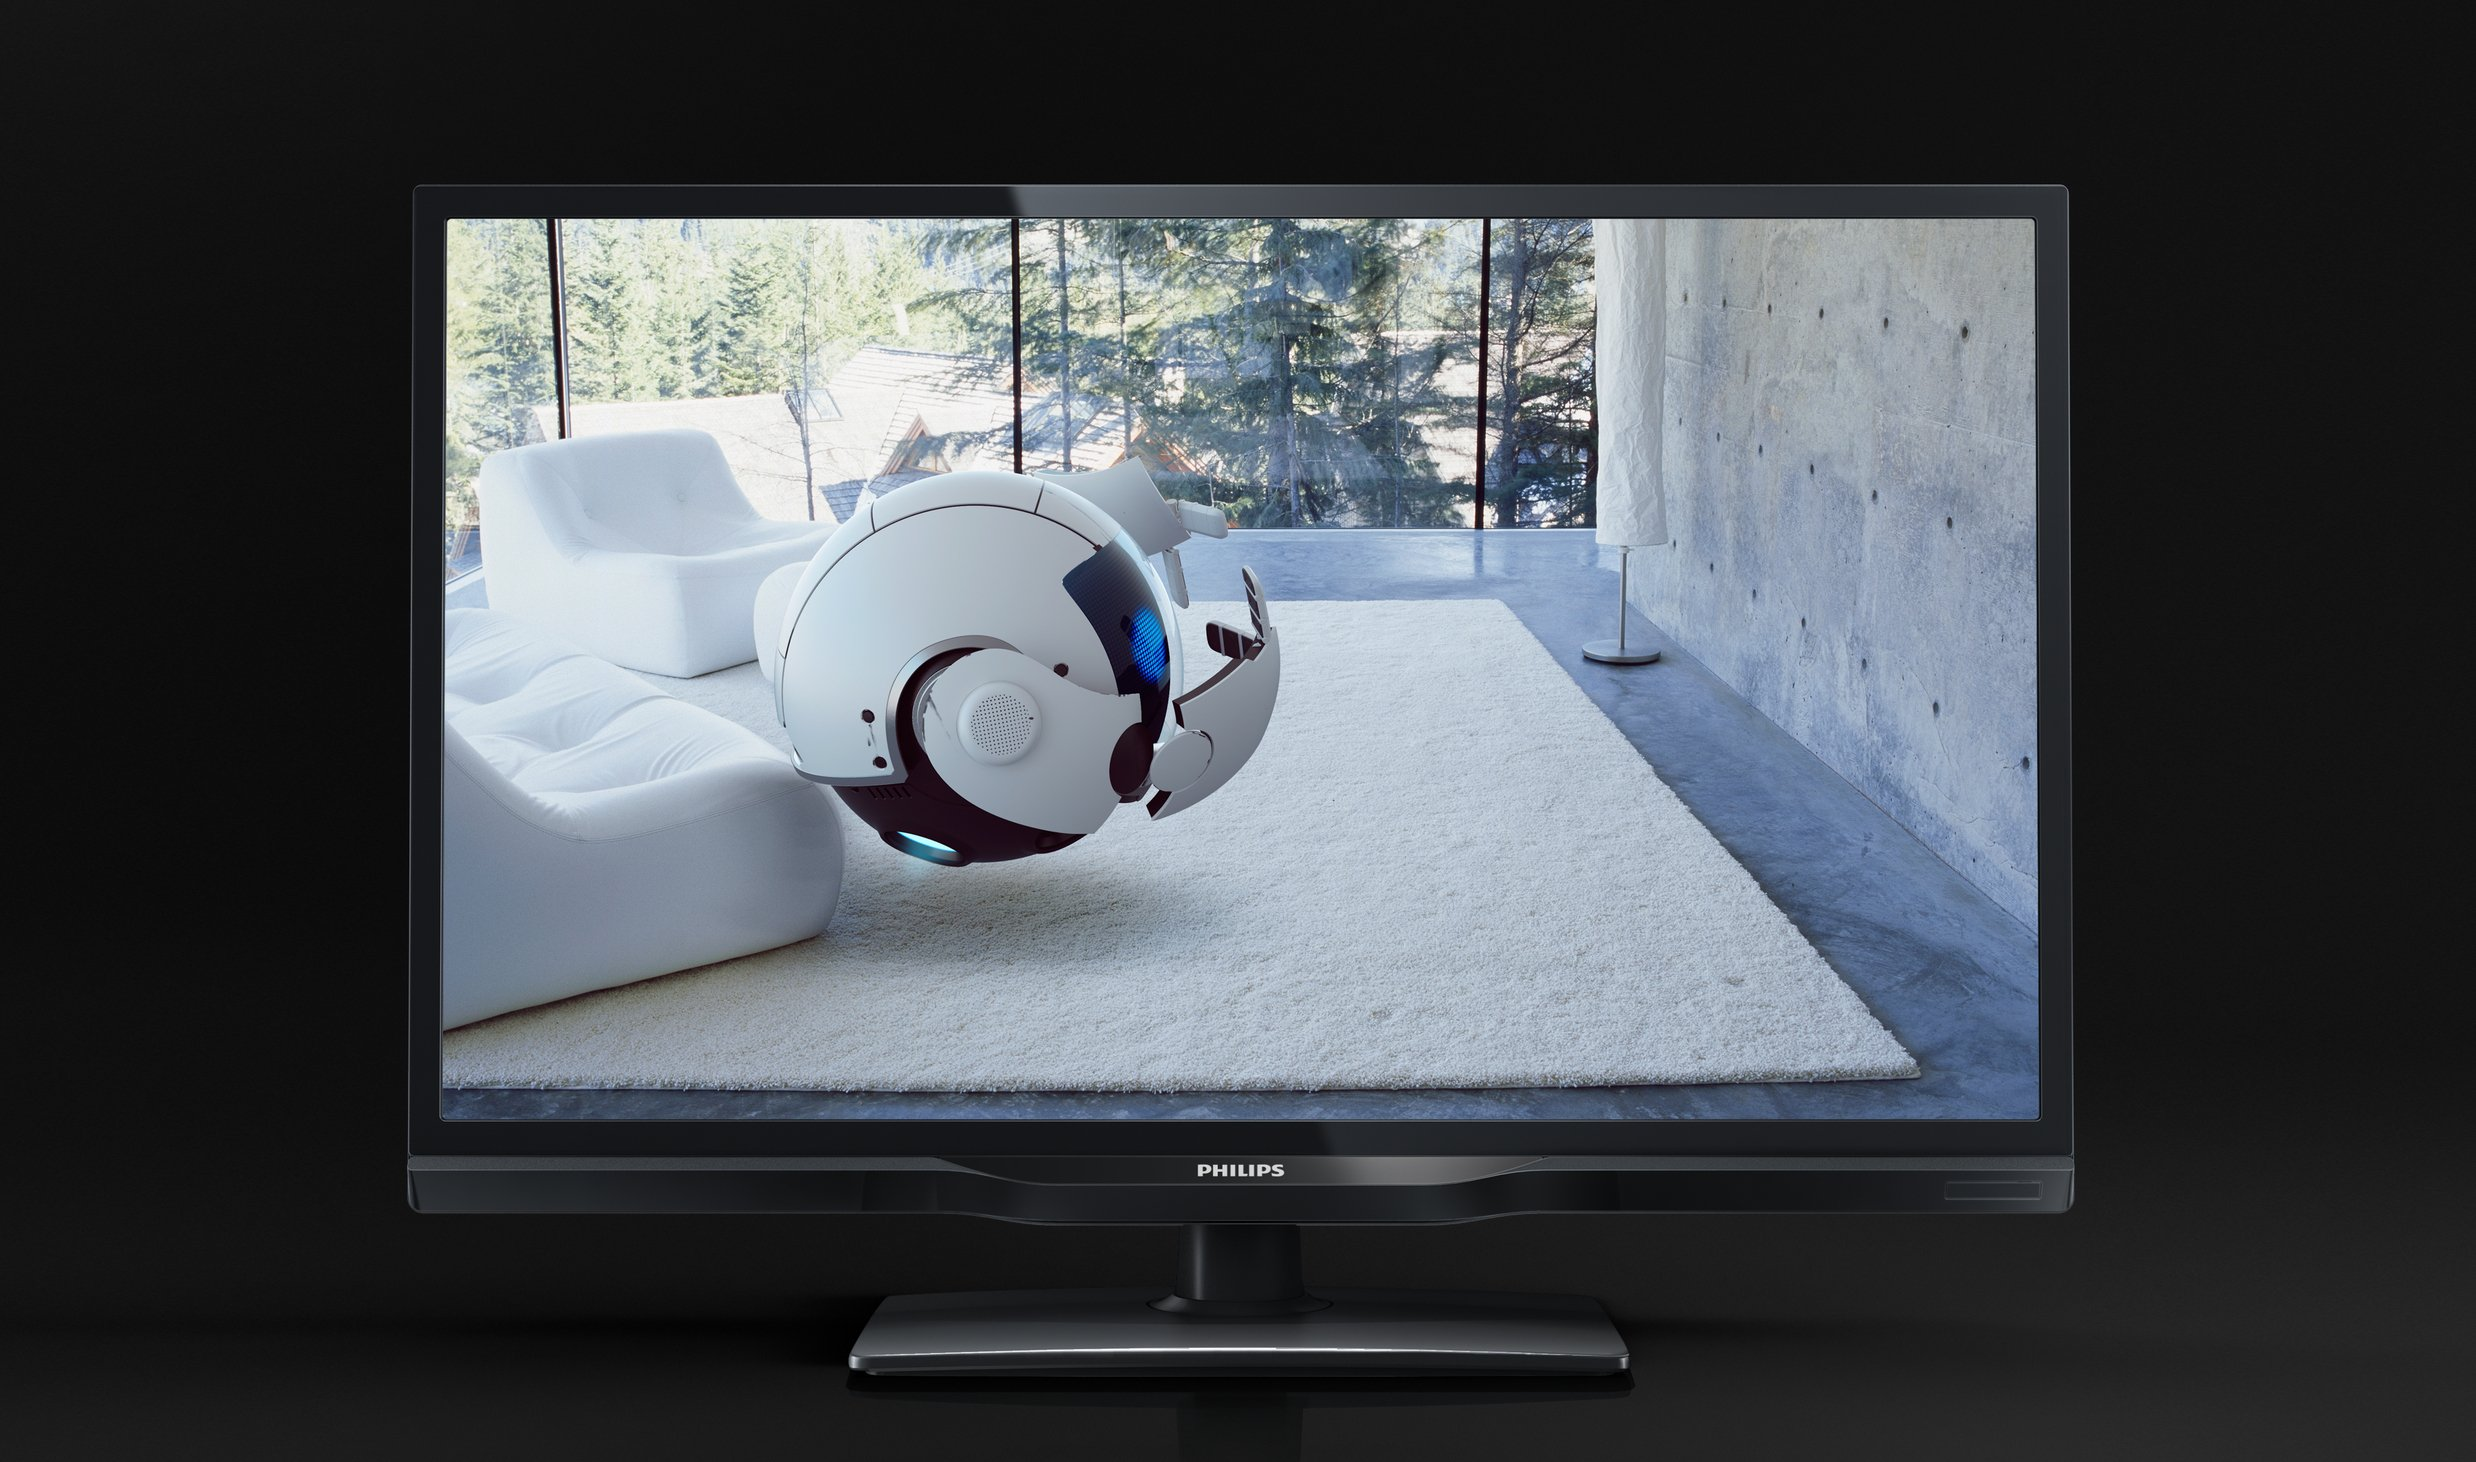 Philips 3100 series - Televisor (Full HD, A, 16:9, 4:3, 14:9, 16:9 ...